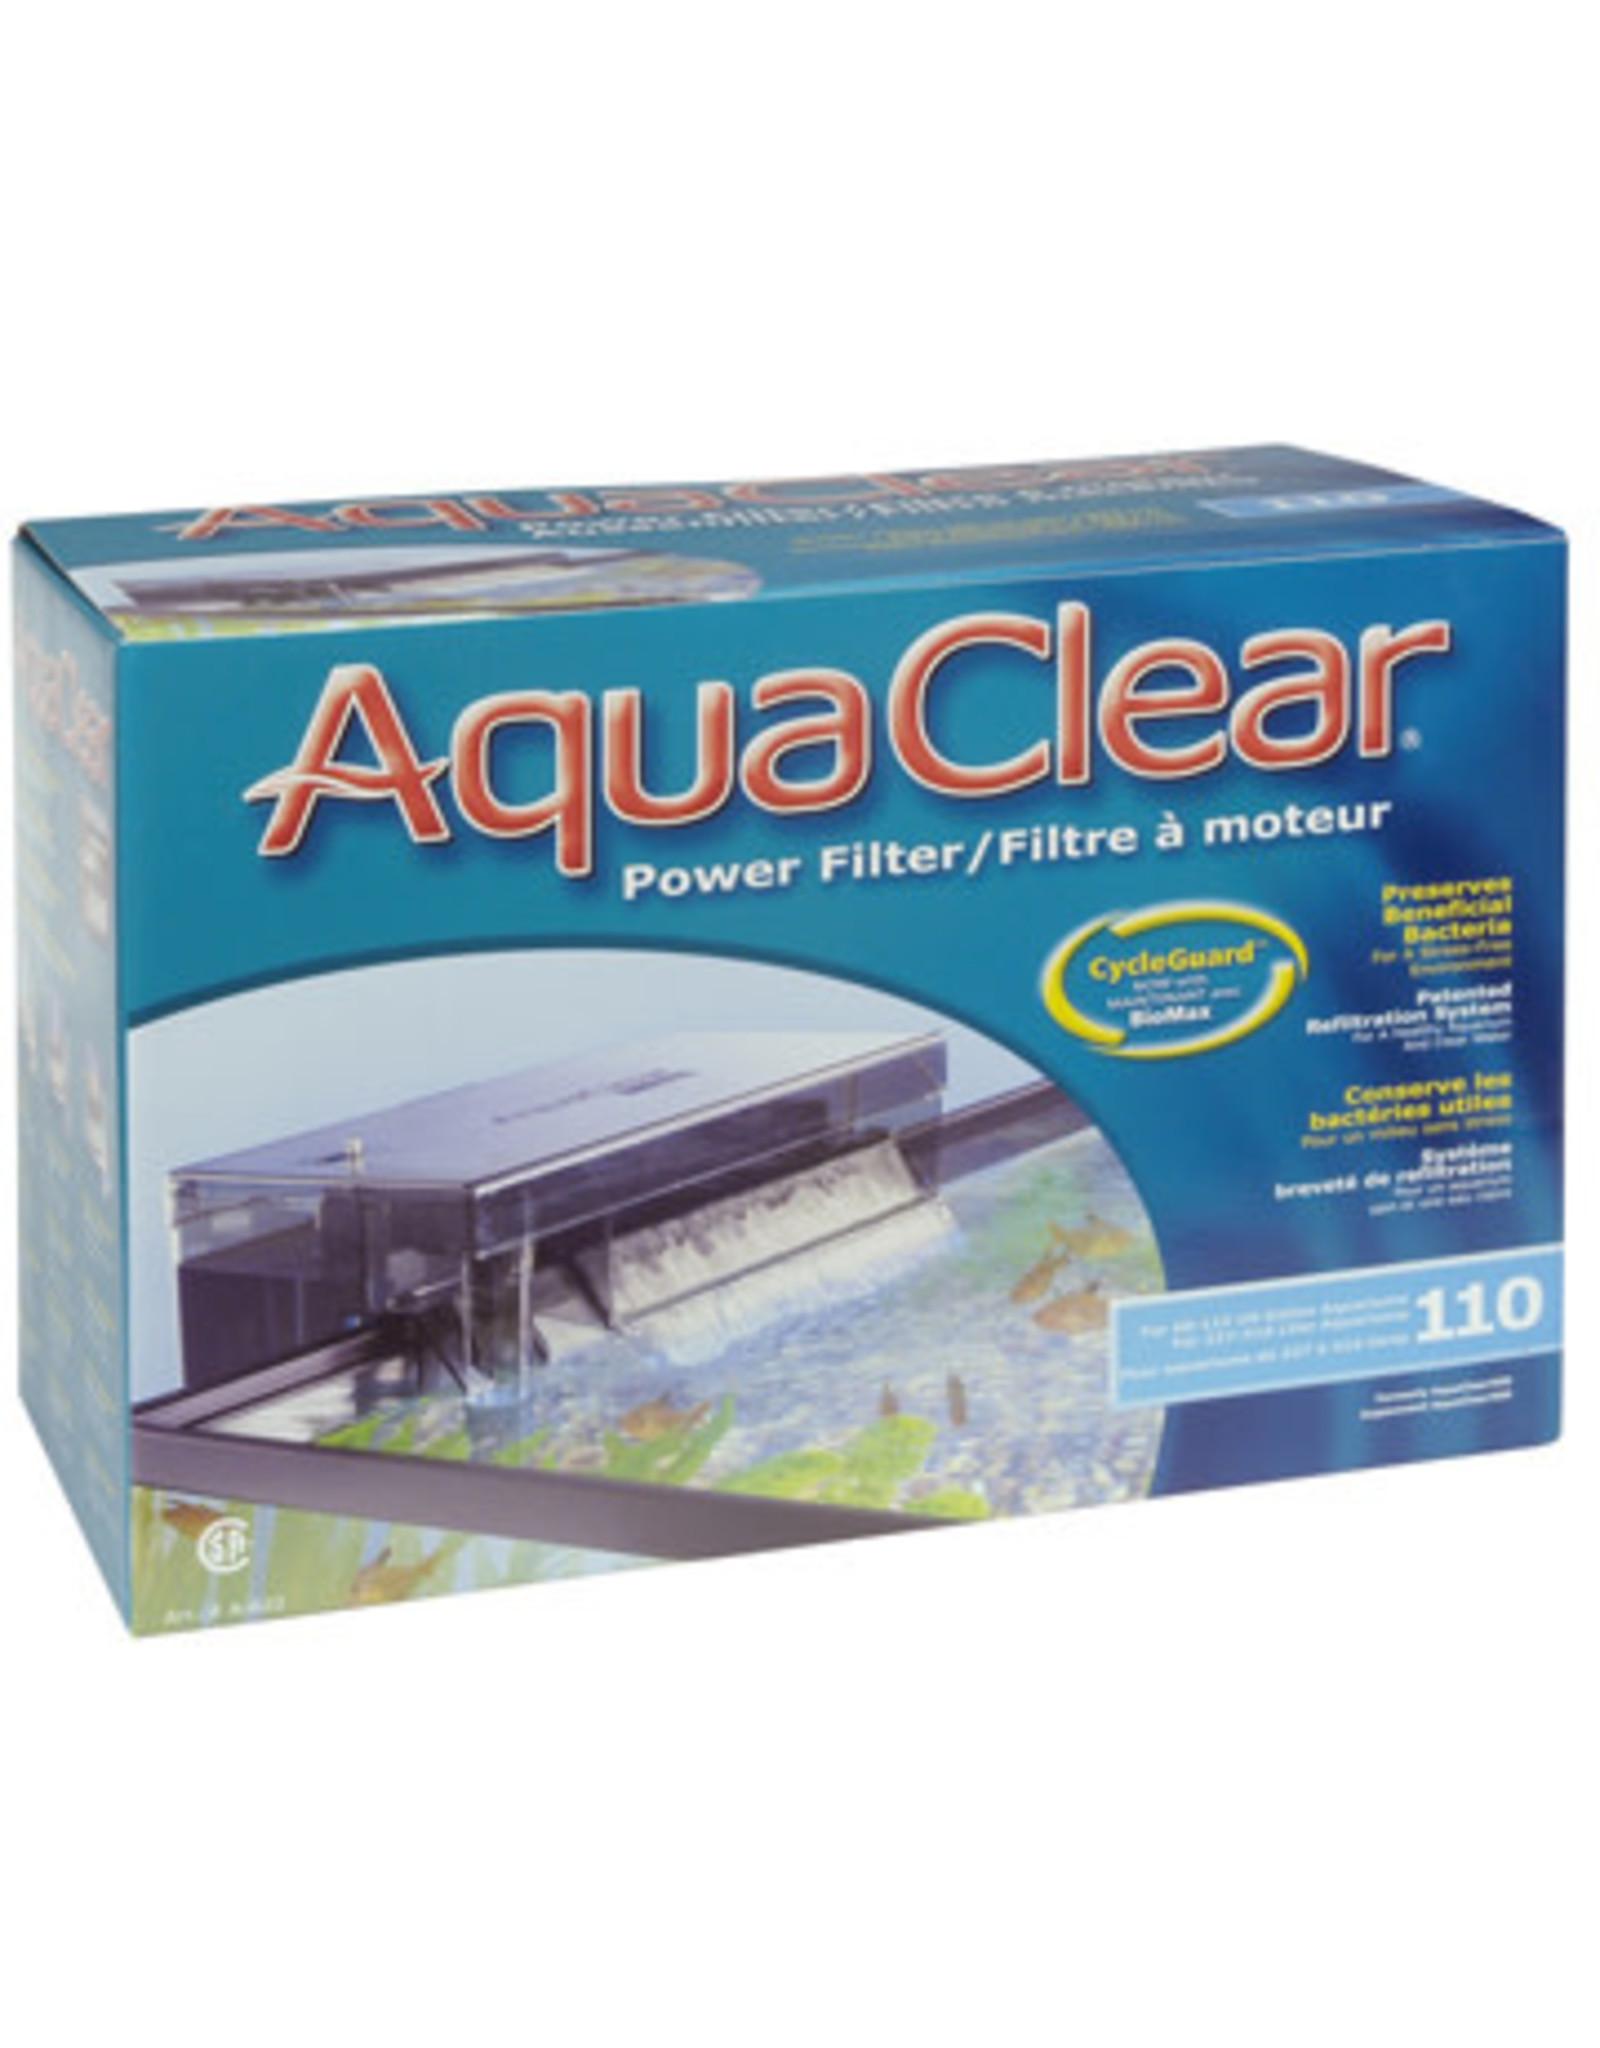 AquaClear AquaClear 110 Power Filter 416L (110 US Gal)